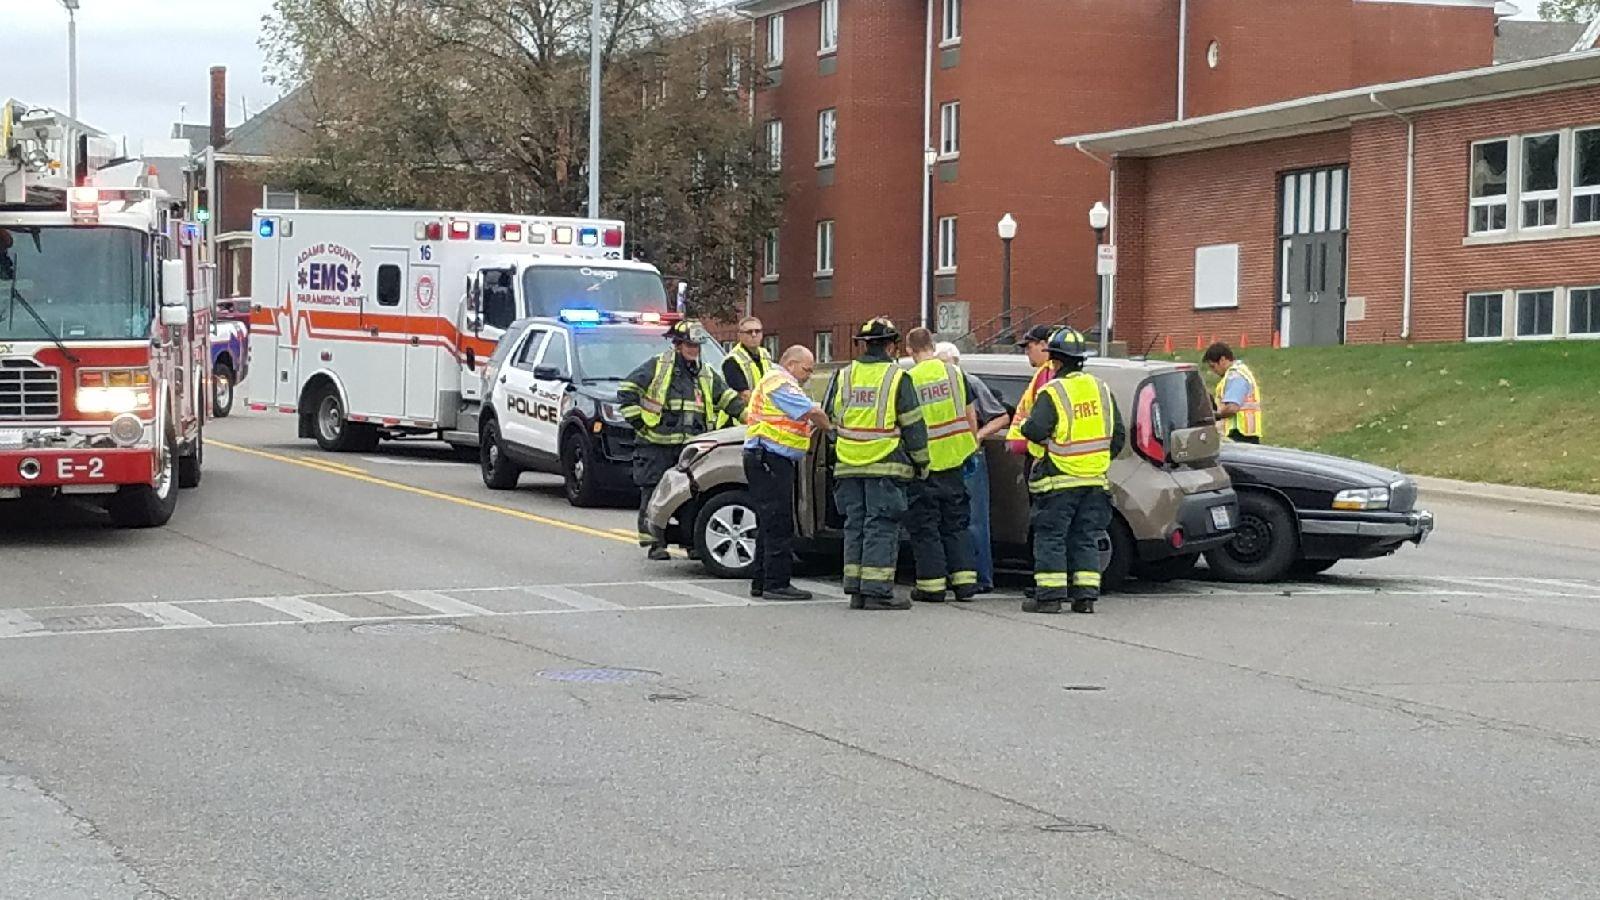 Emergency crews work at the scene.